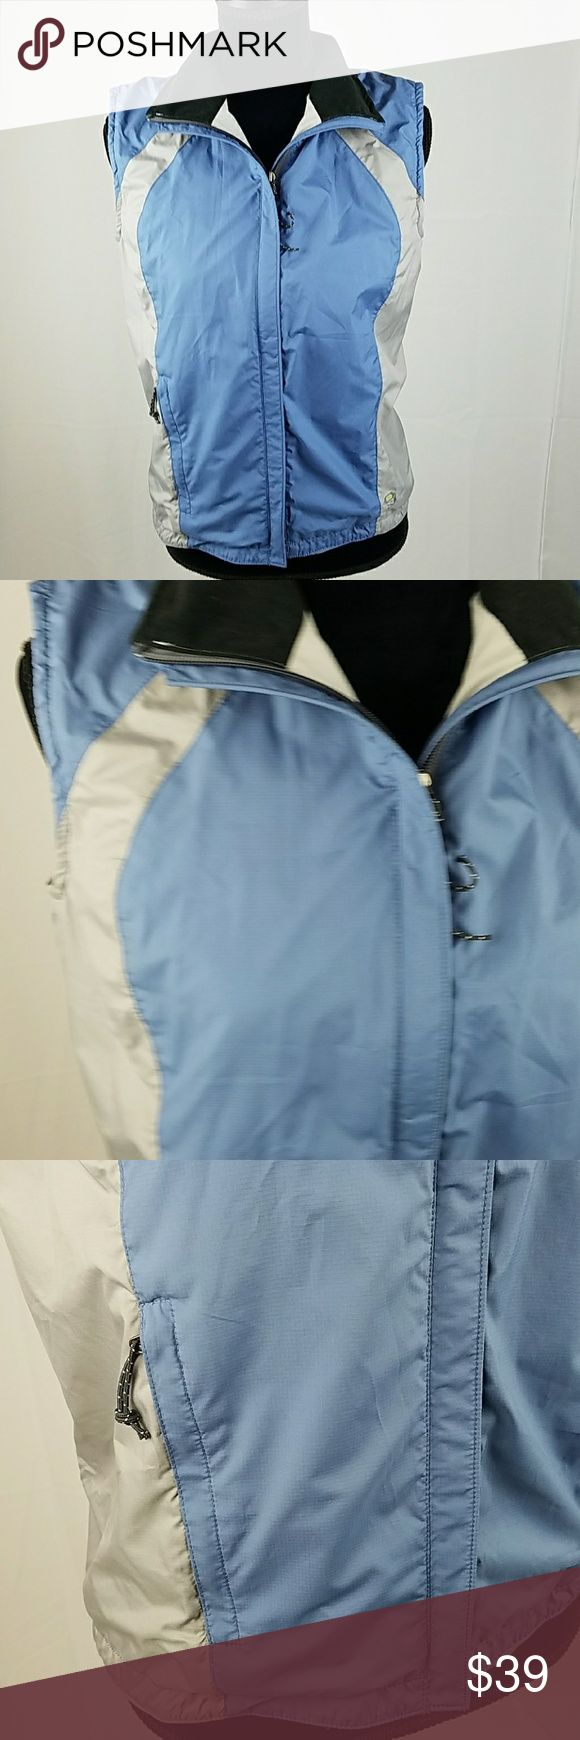 "Mountain Hardwear women S/P wind stopper vest Mountain Hardwear women S/P wind stopper vest outdoor hiking.  Under arm to under arm: 19"" Length: 26.5"" Mountain Hardwear Jackets & Coats Vests"